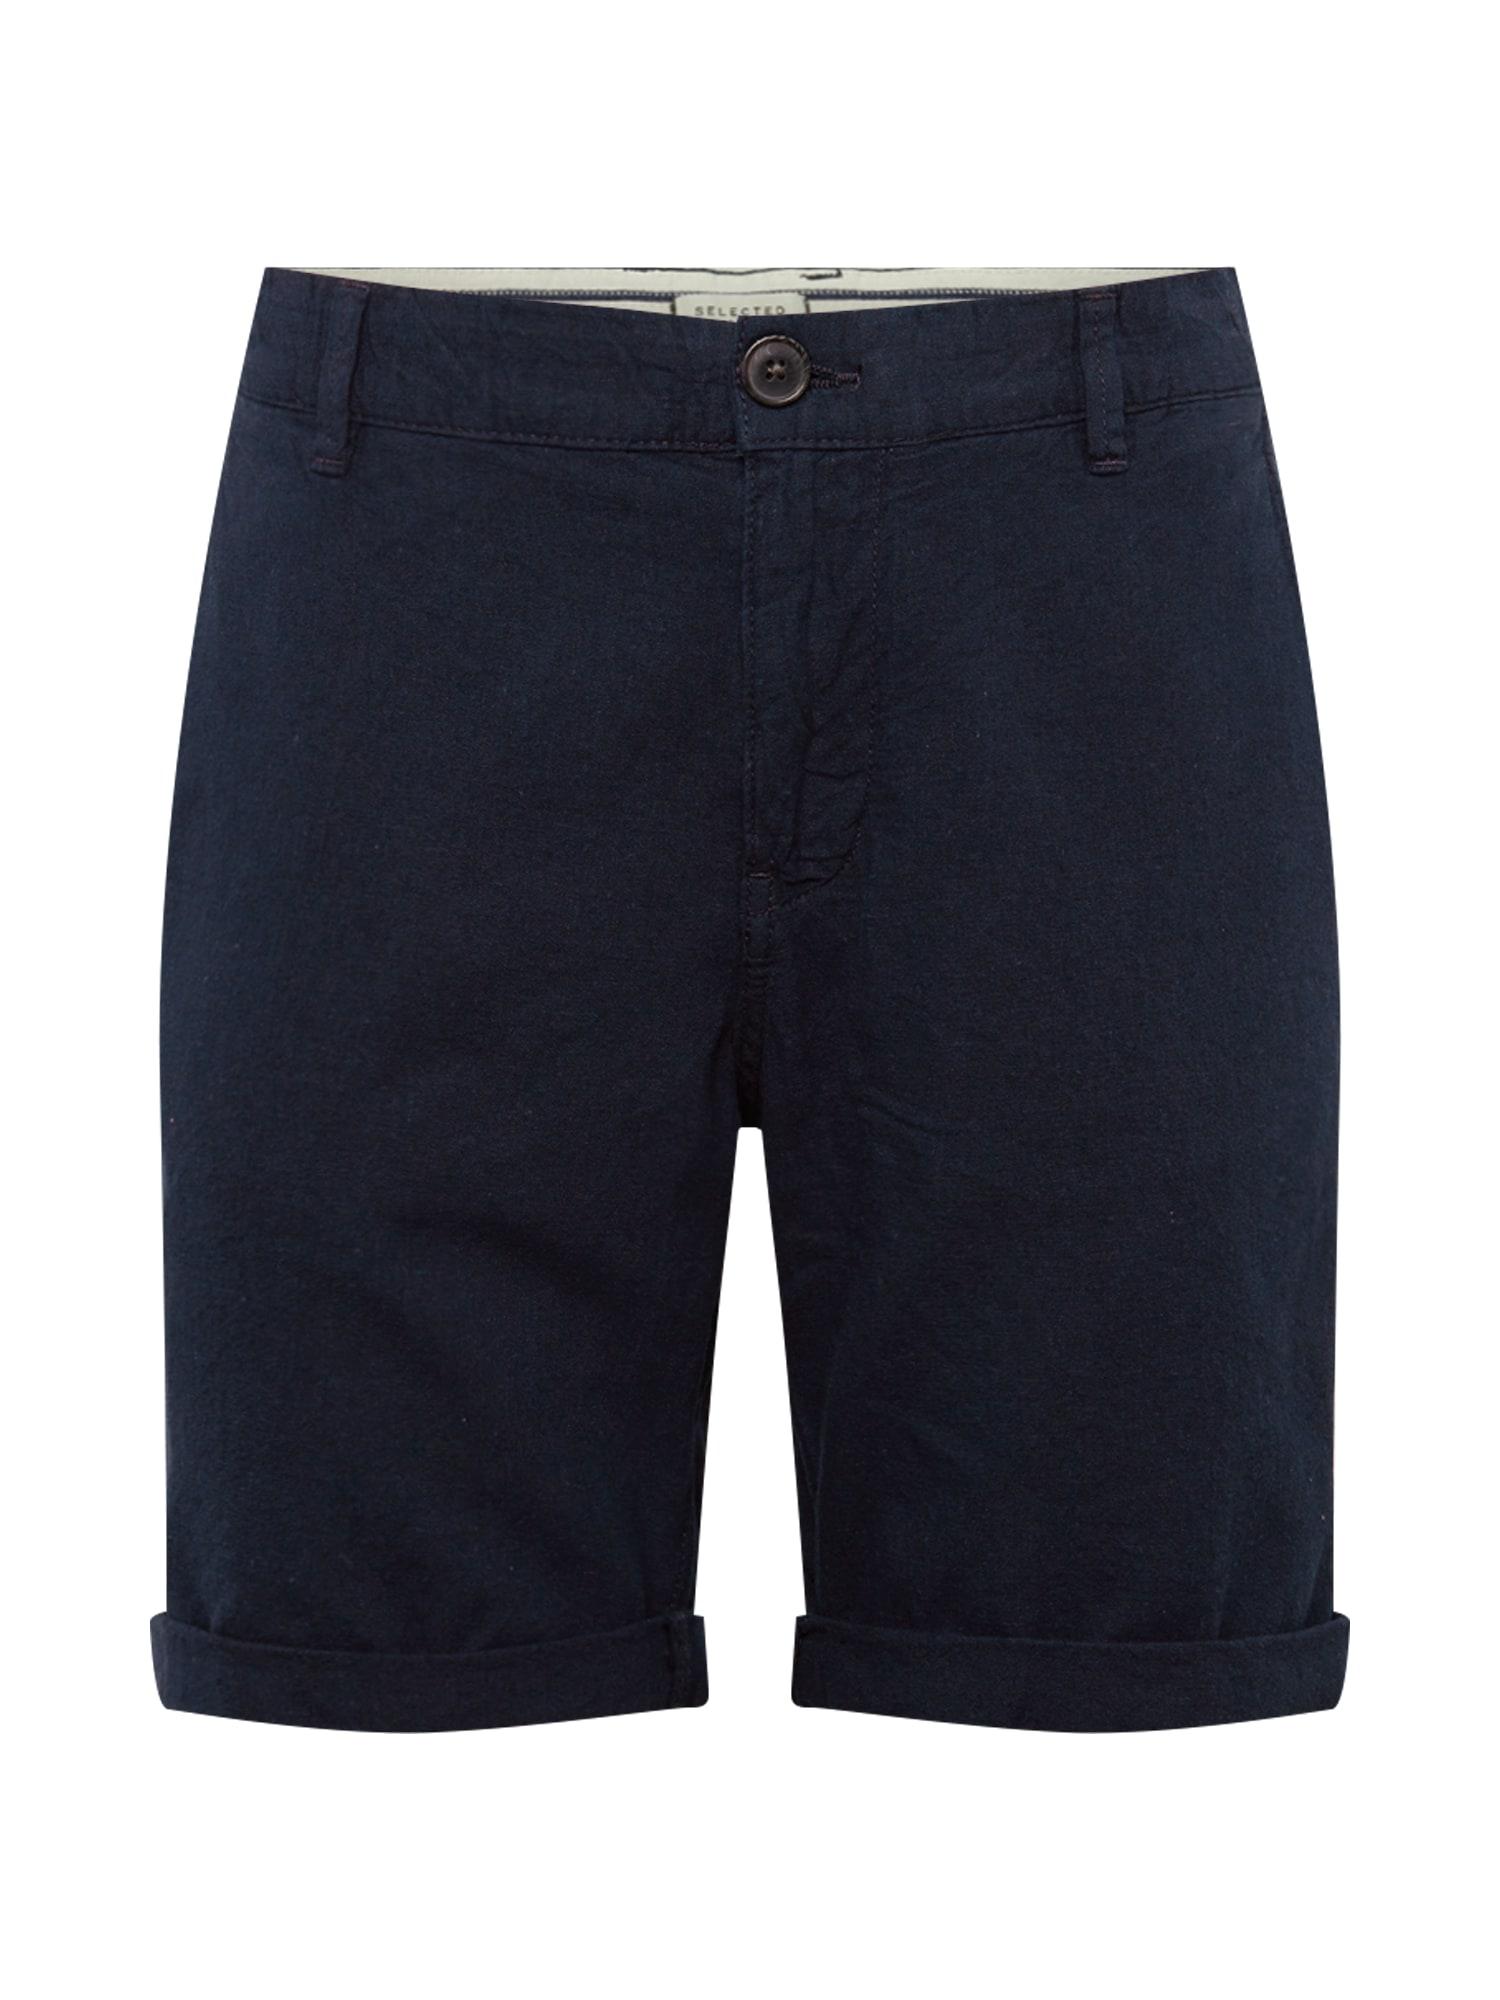 Chino kalhoty SLHStraight-Paris W tmavě modrá SELECTED HOMME